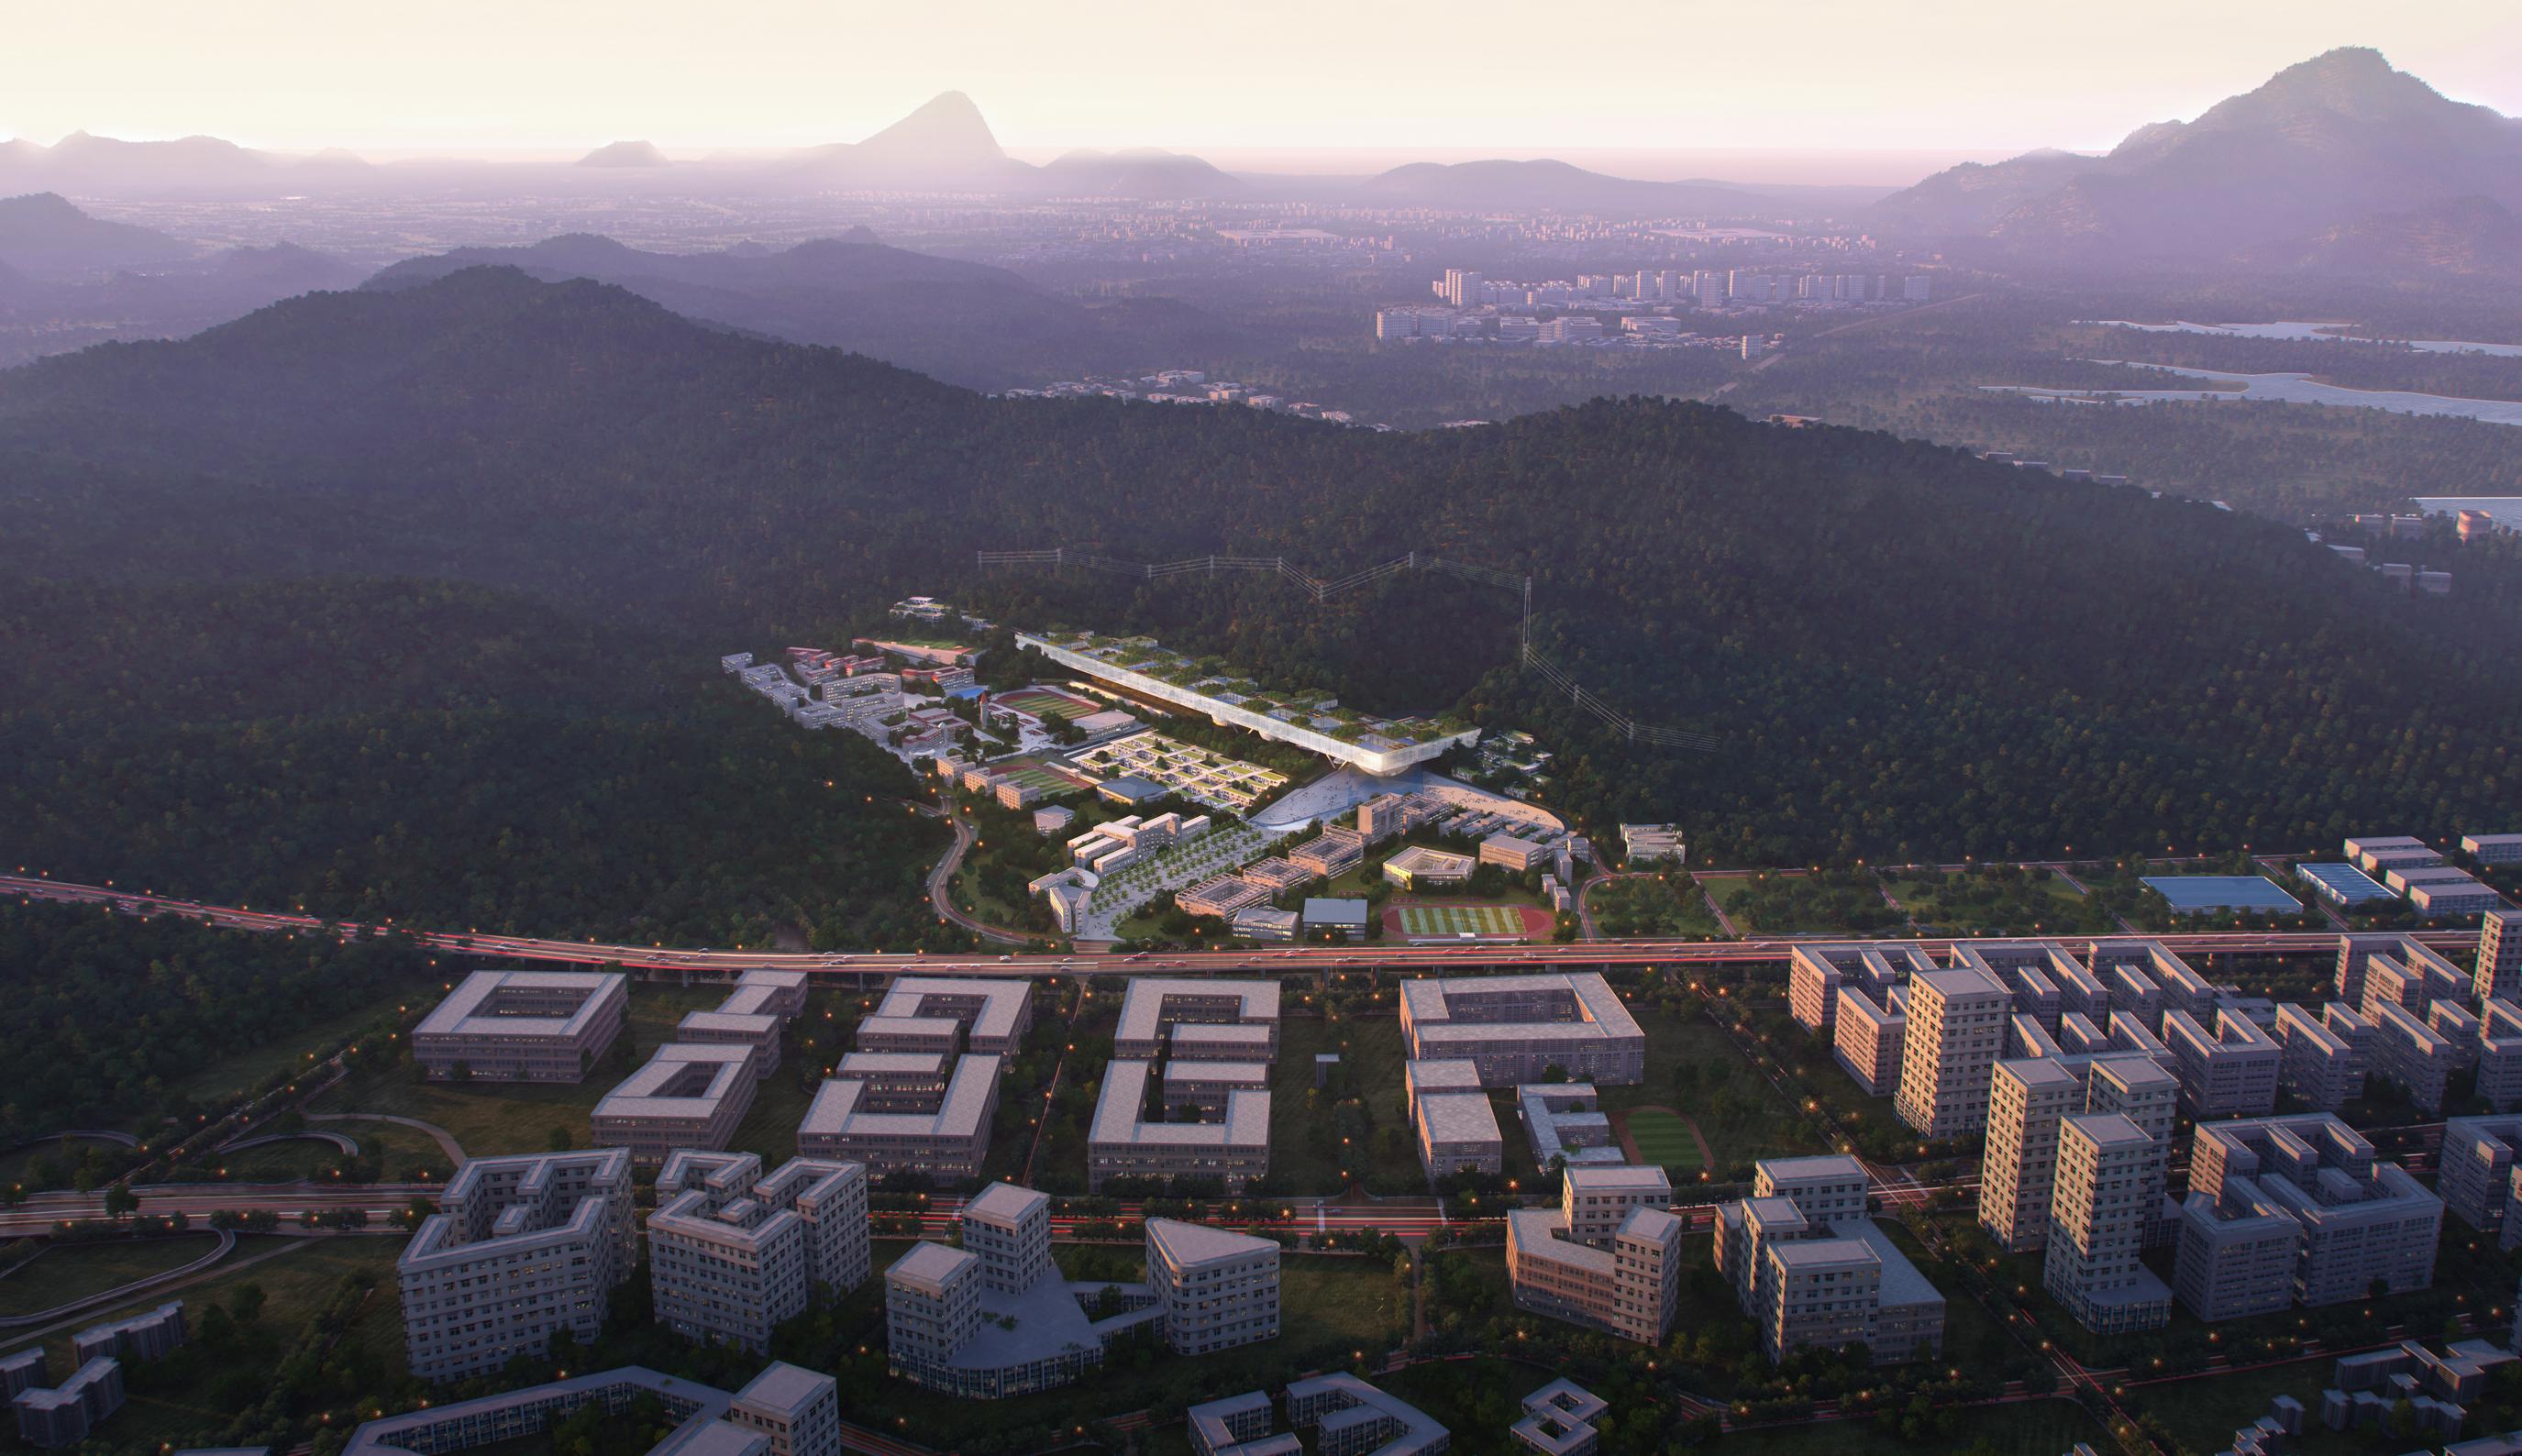 Shenzhen Institute of Design and Innovation